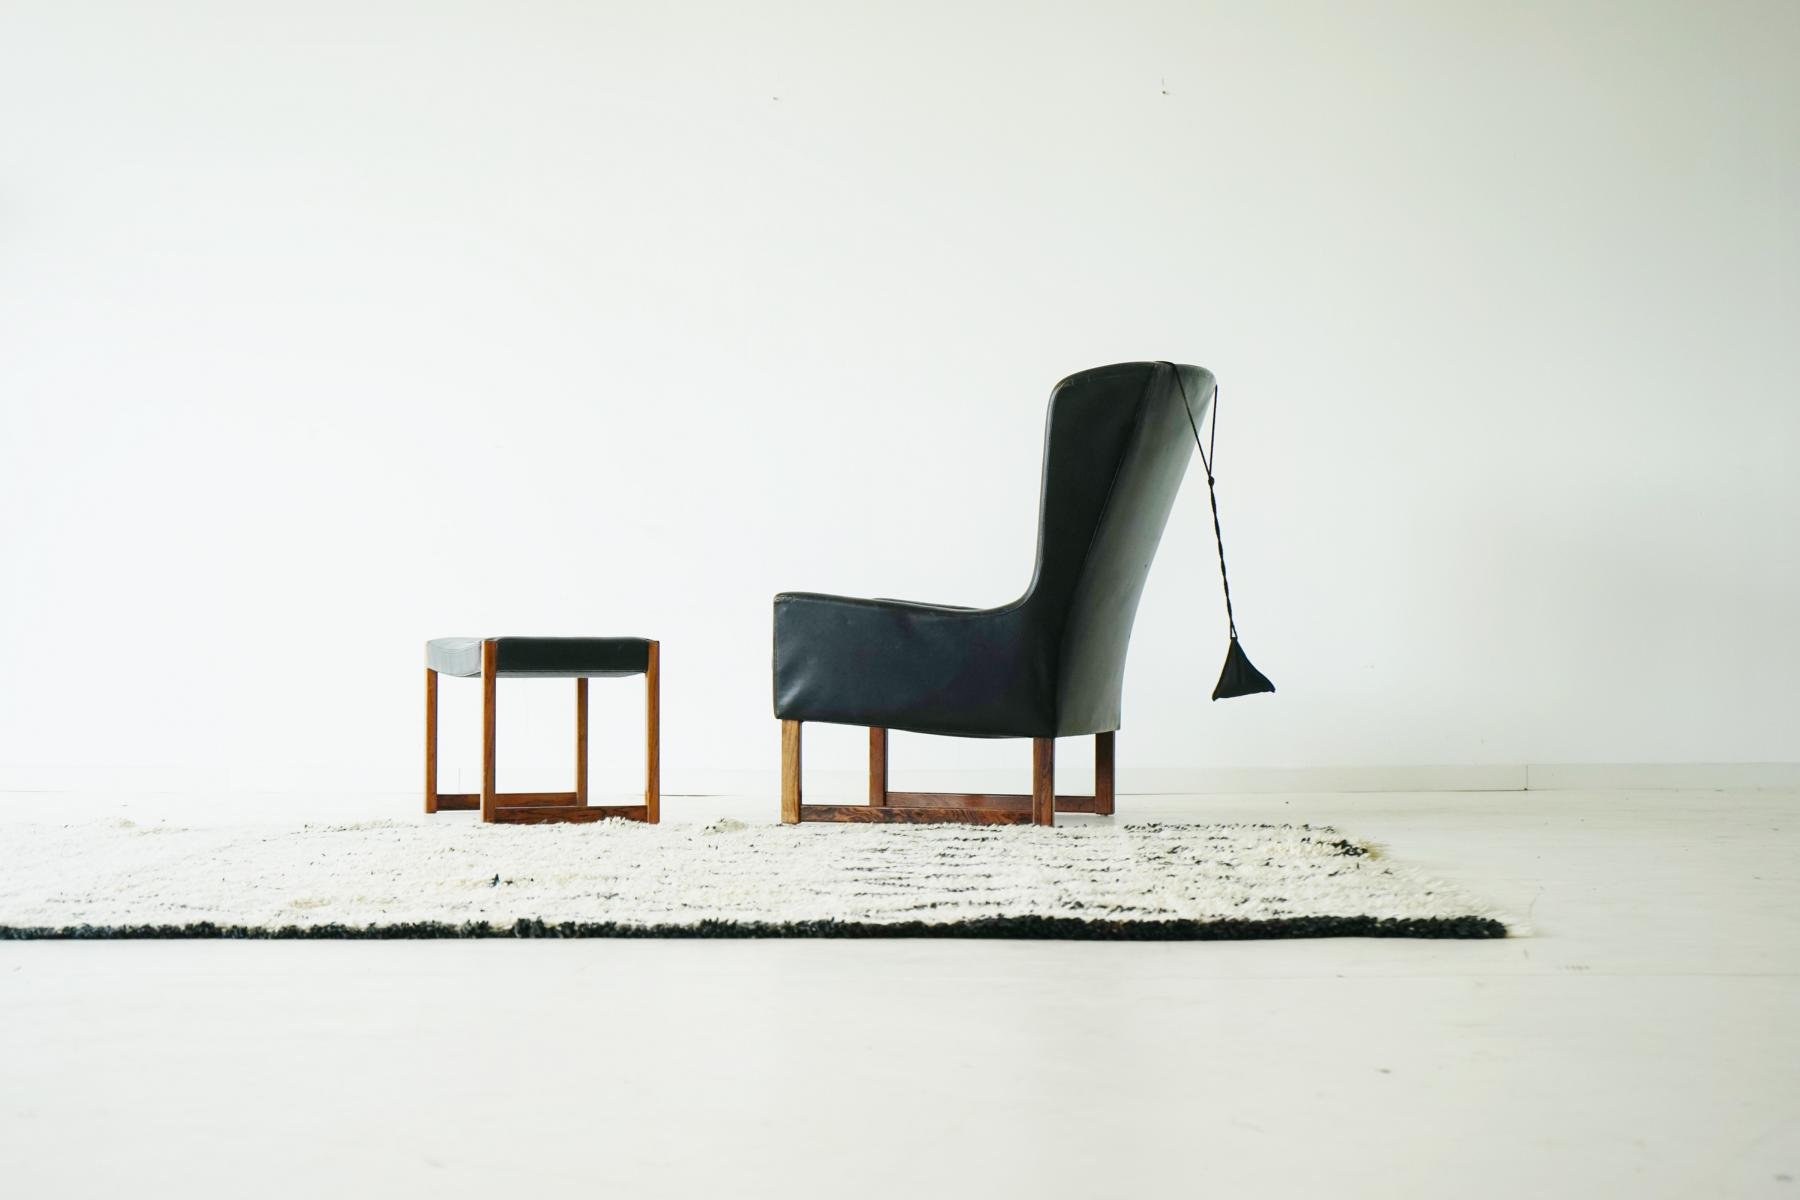 modell 6480 palisander sessel mit hocker von alfred kill f r kill international 1960er bei. Black Bedroom Furniture Sets. Home Design Ideas